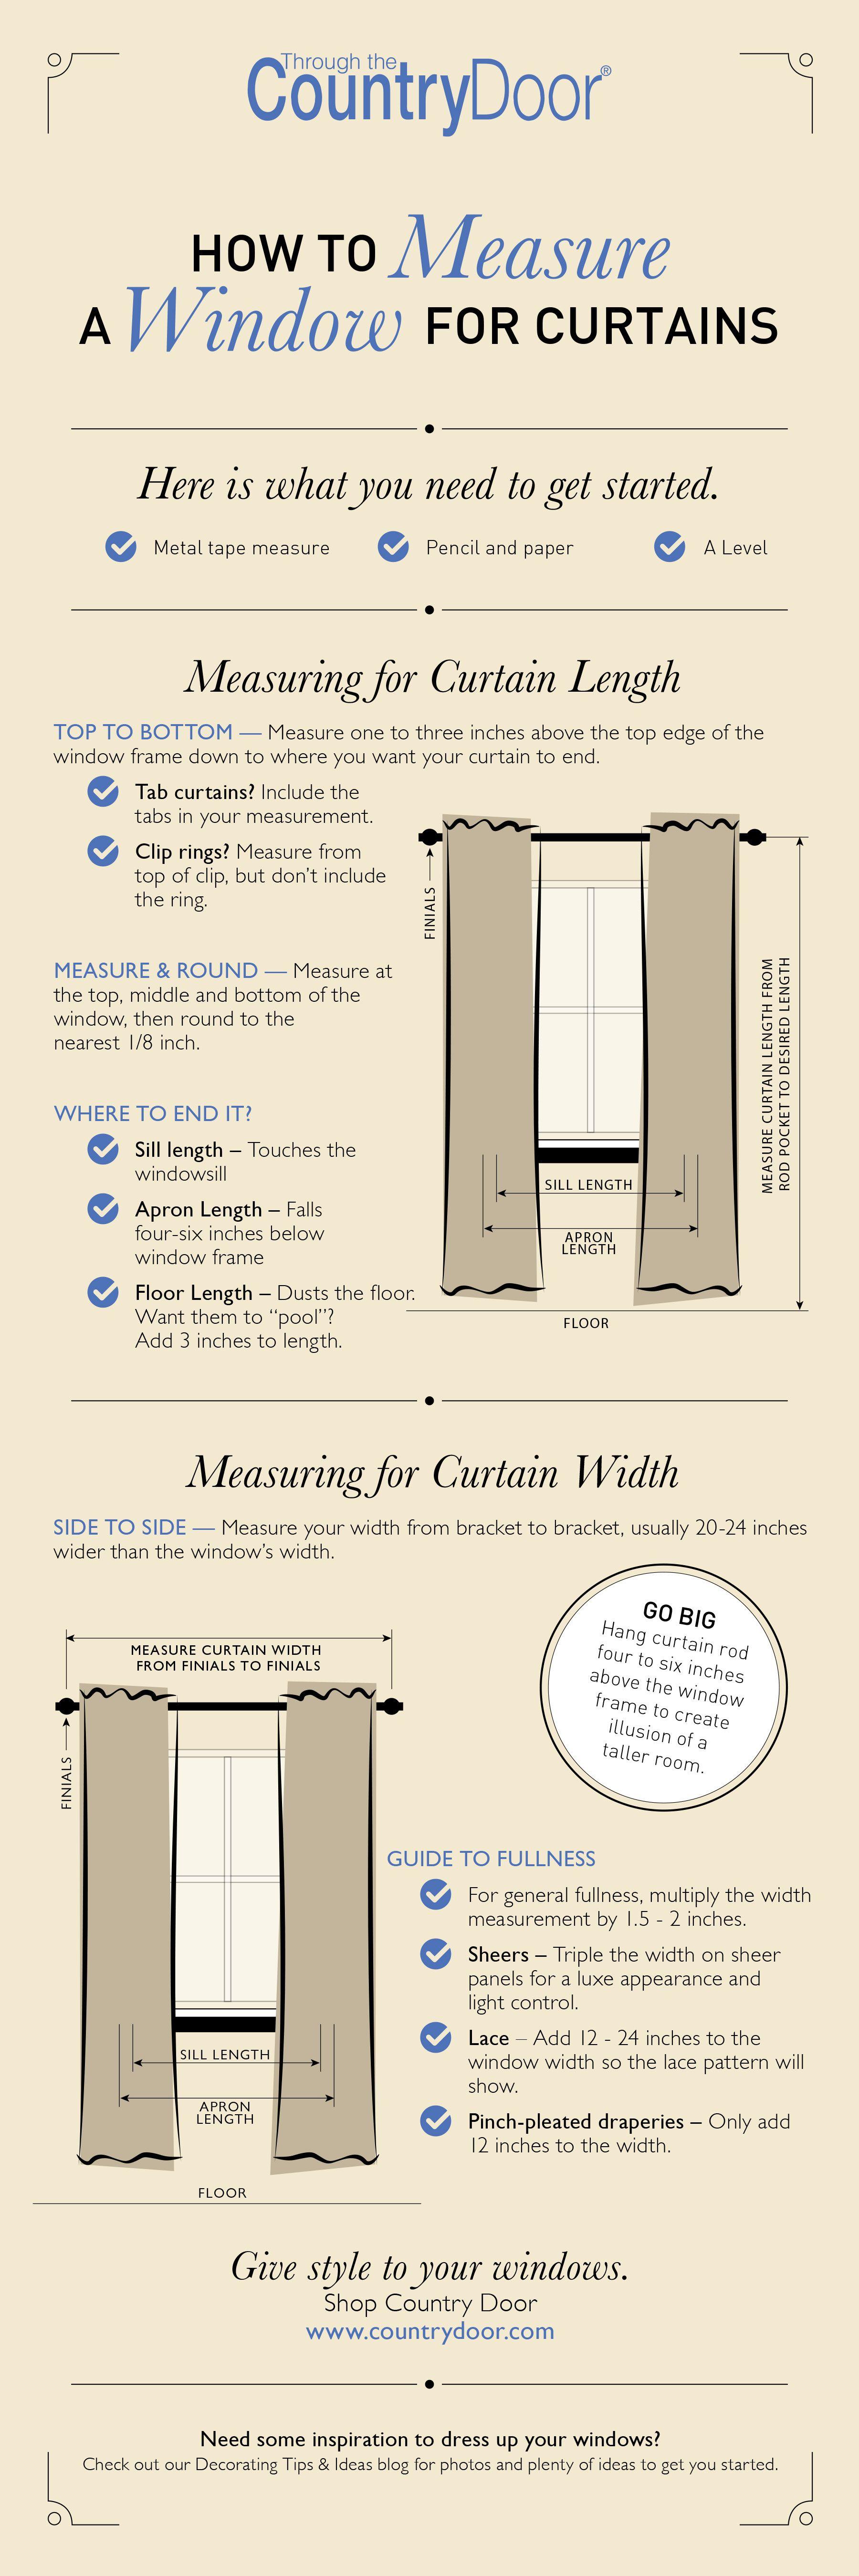 How to Measure a Window for Curtains | Pinterest - Creatief handwerk ...